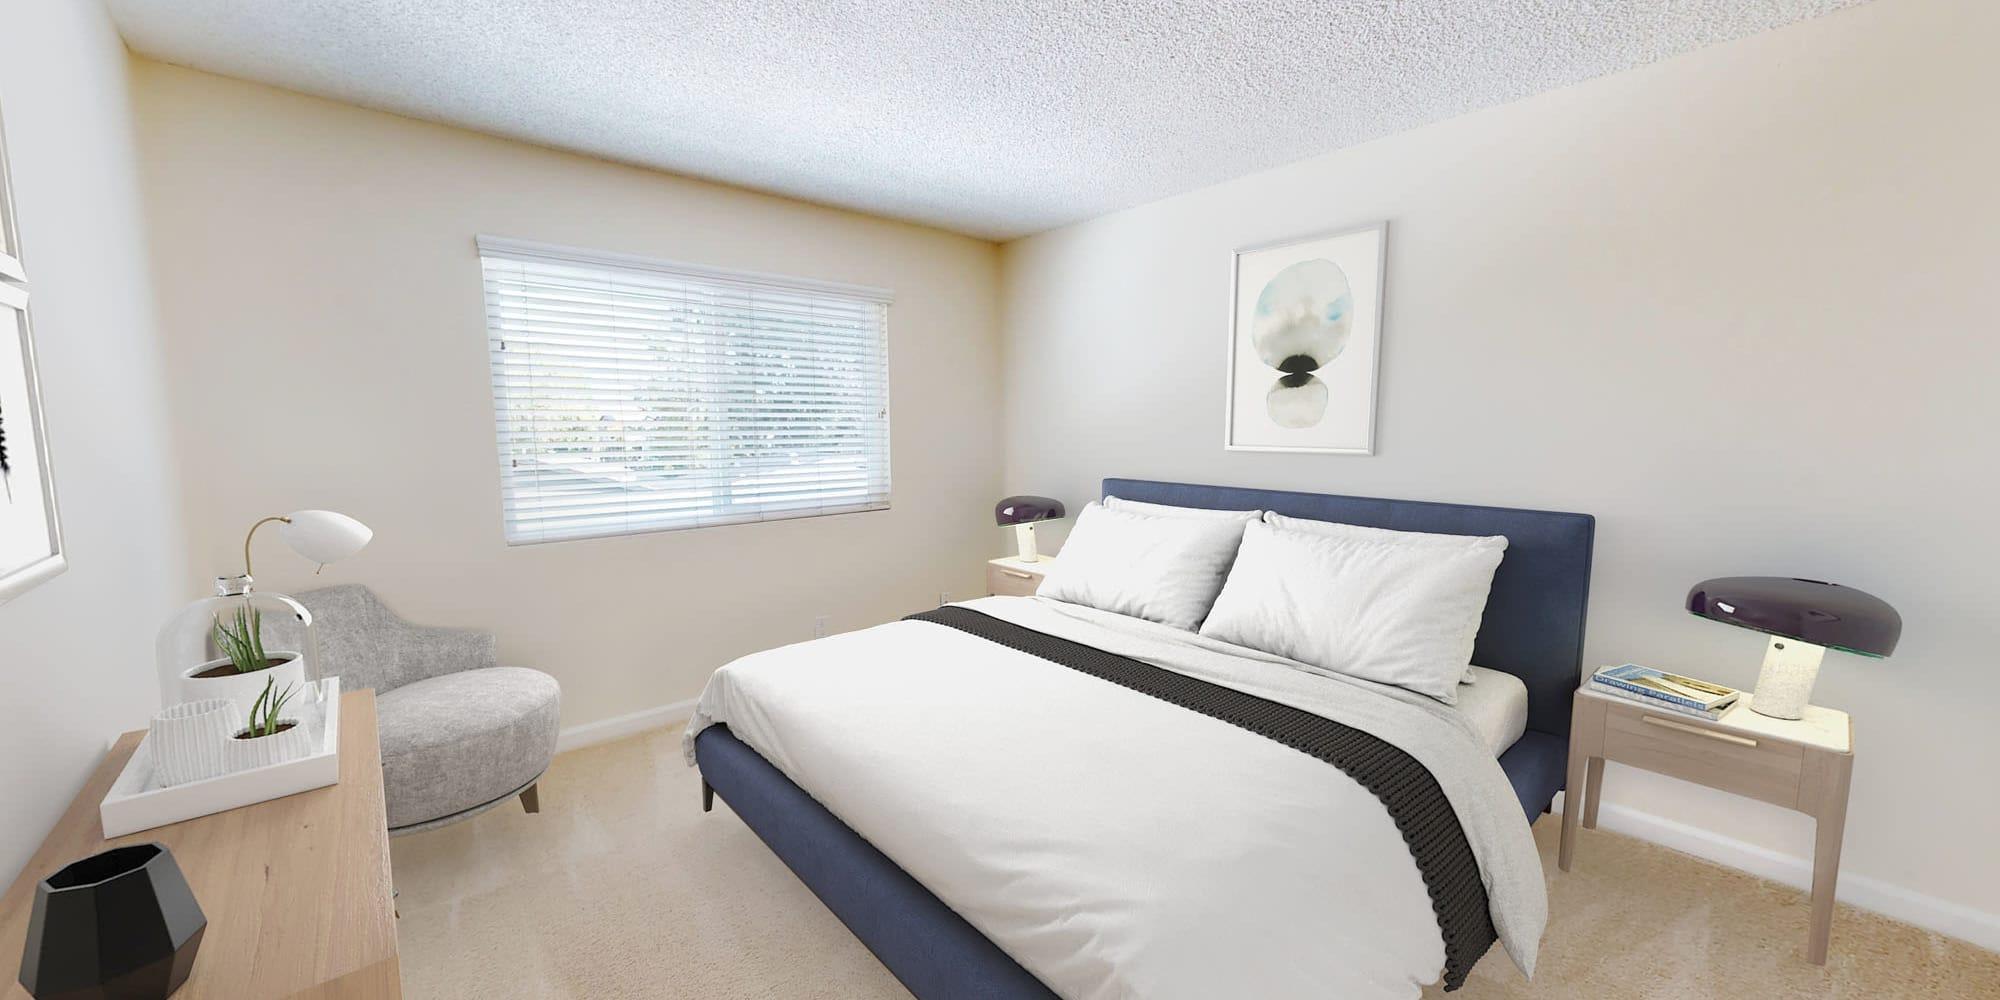 Plush carpeting in a model home's bedroom at Pleasanton Glen Apartment Homes in Pleasanton, California